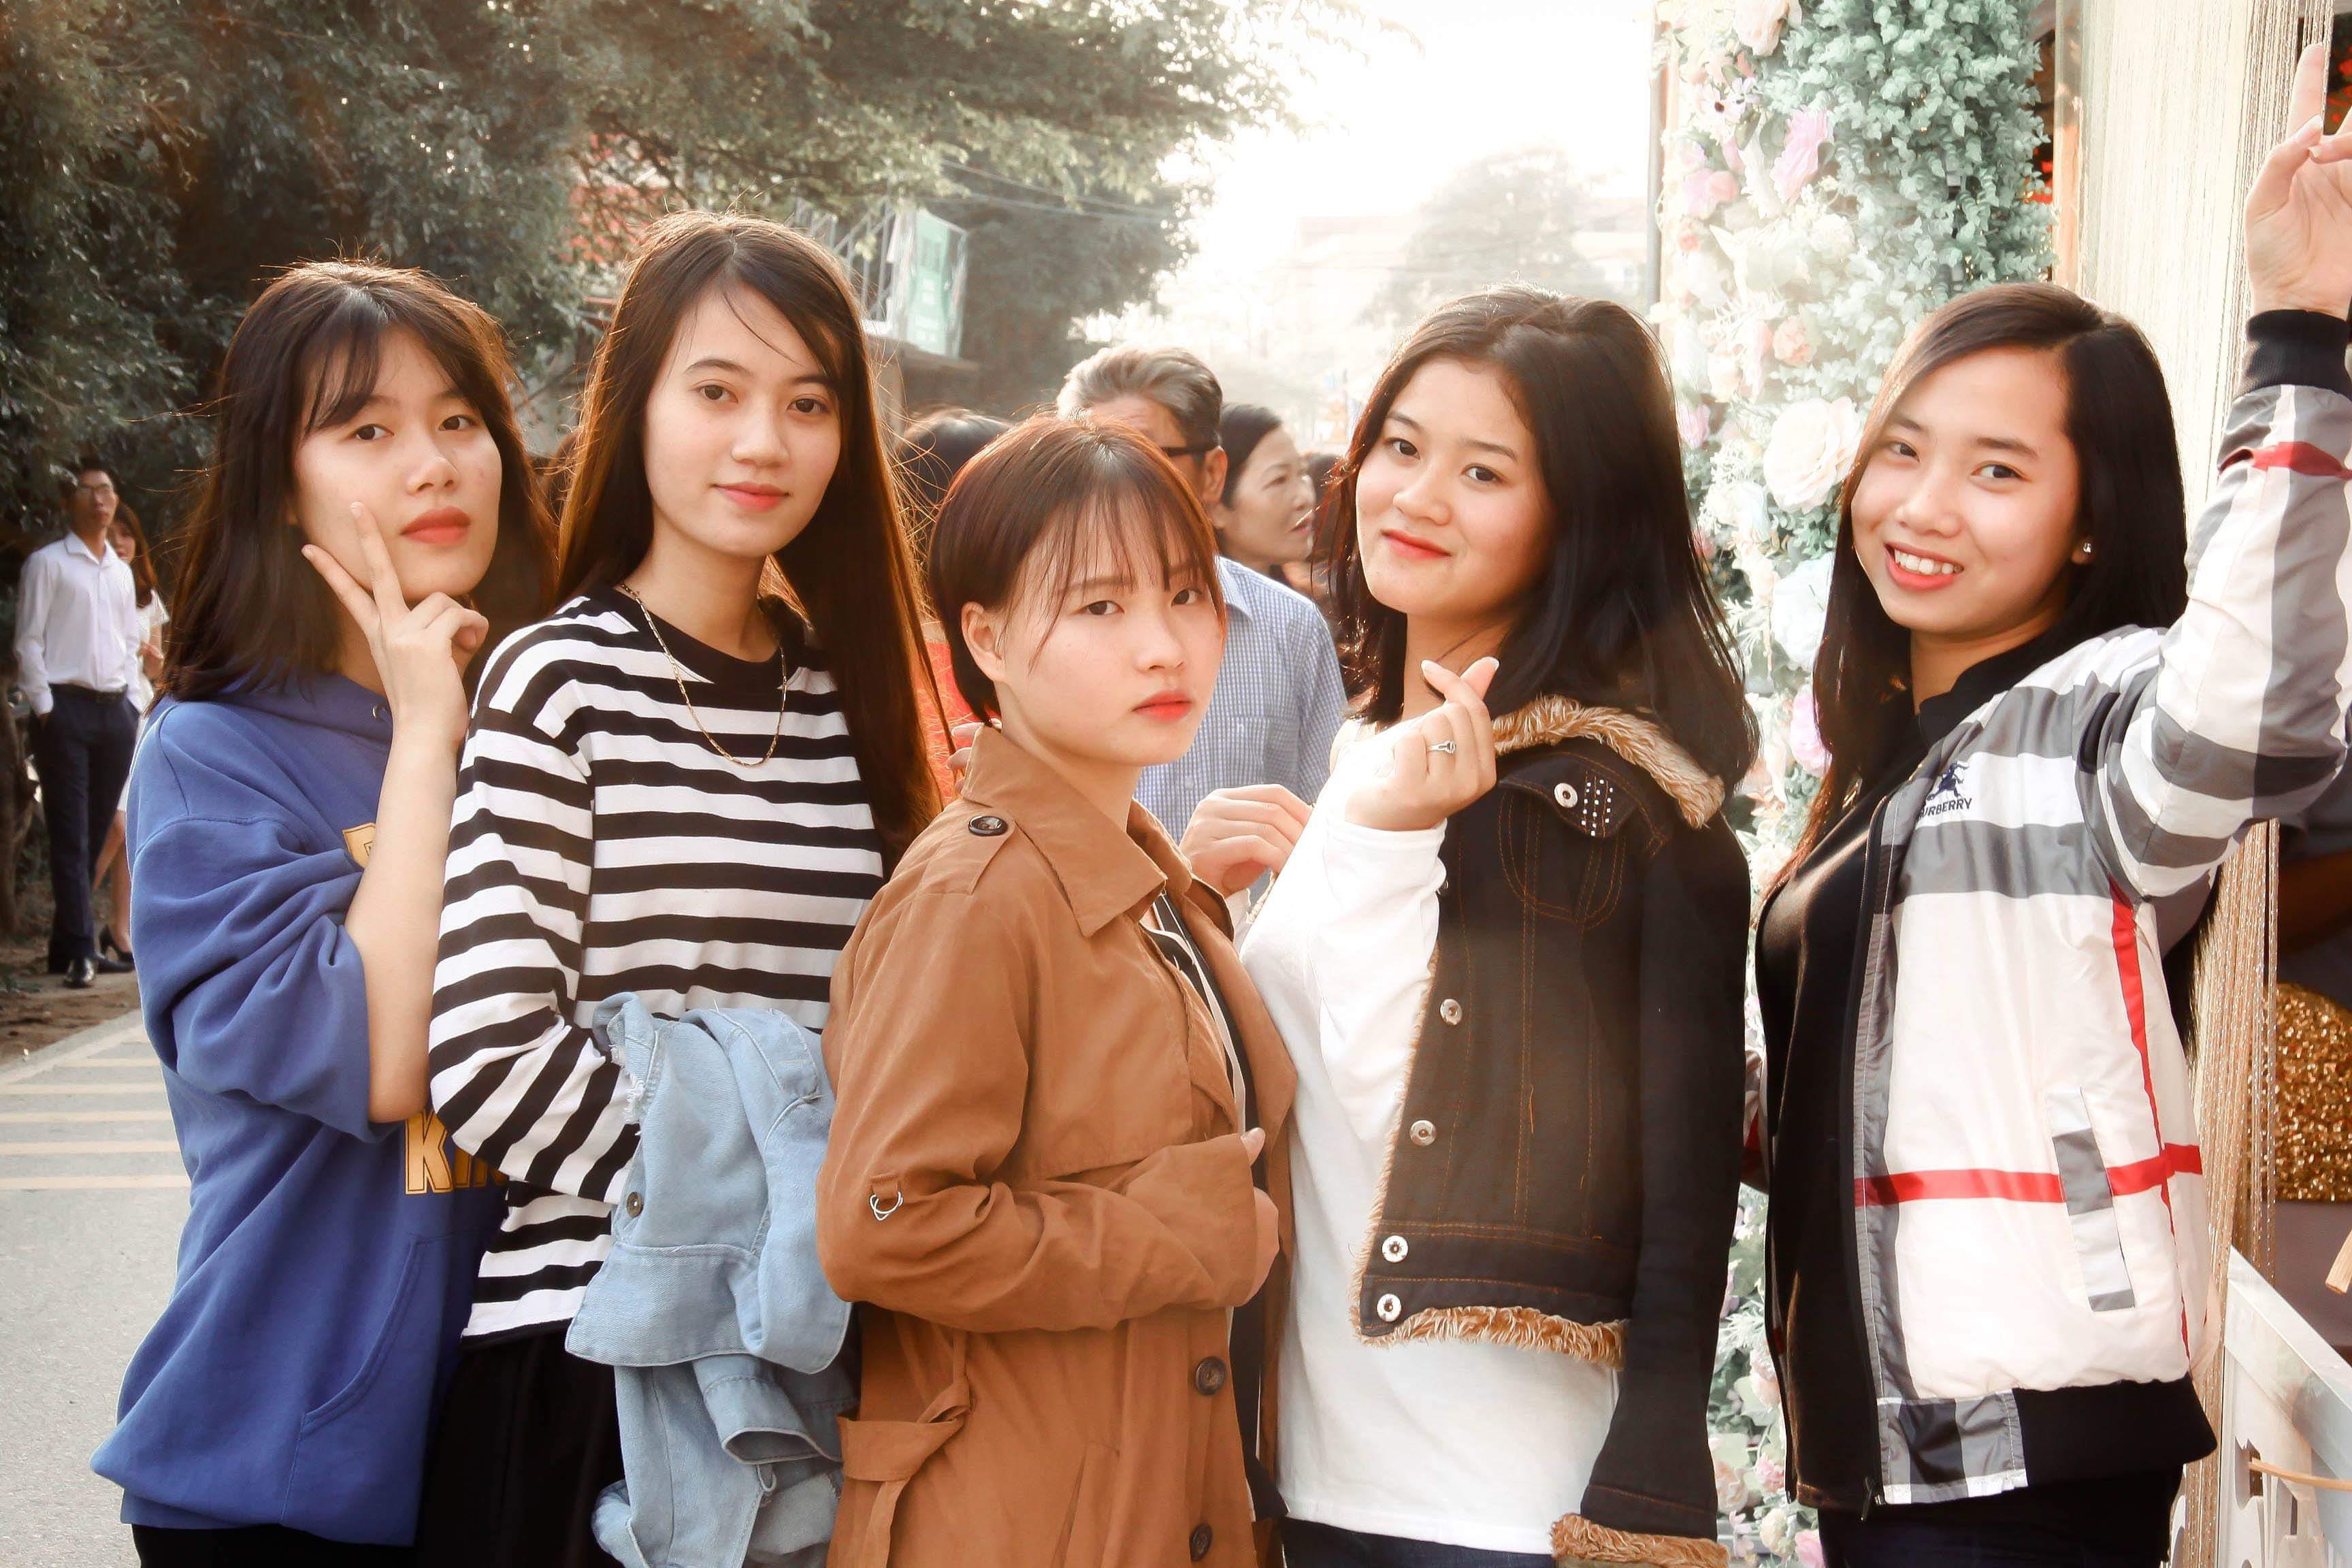 Group of Women Standing Beside Wall